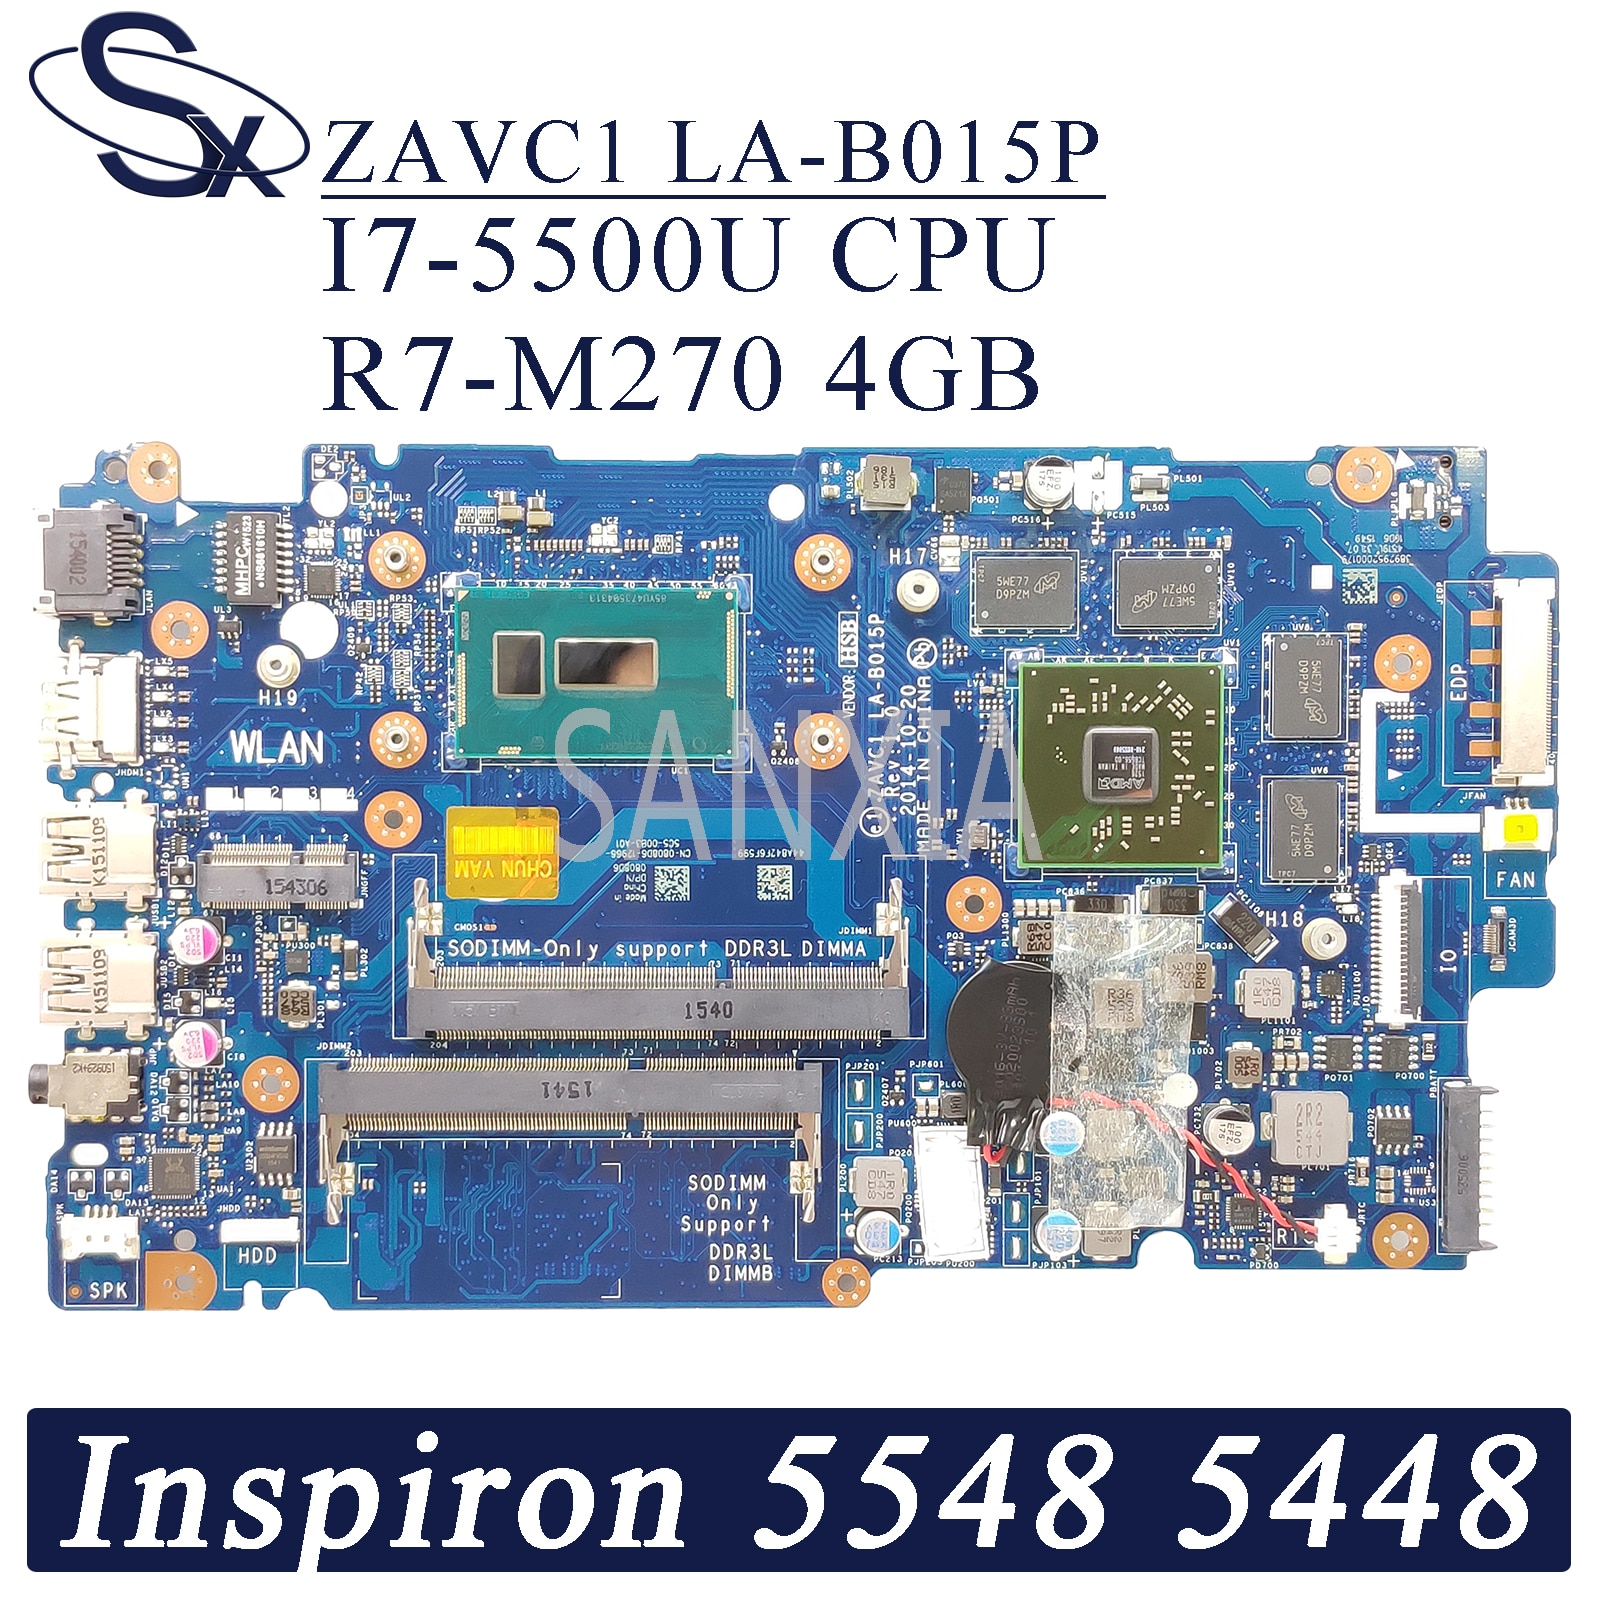 KEFU ZAVC1 LA-B015P اللوحة الأم لأجهزة الكمبيوتر المحمول ديل انسبايرون 15-5548 5448 اللوحة الرئيسية الأصلية I7-5500U R7-M270 4GB